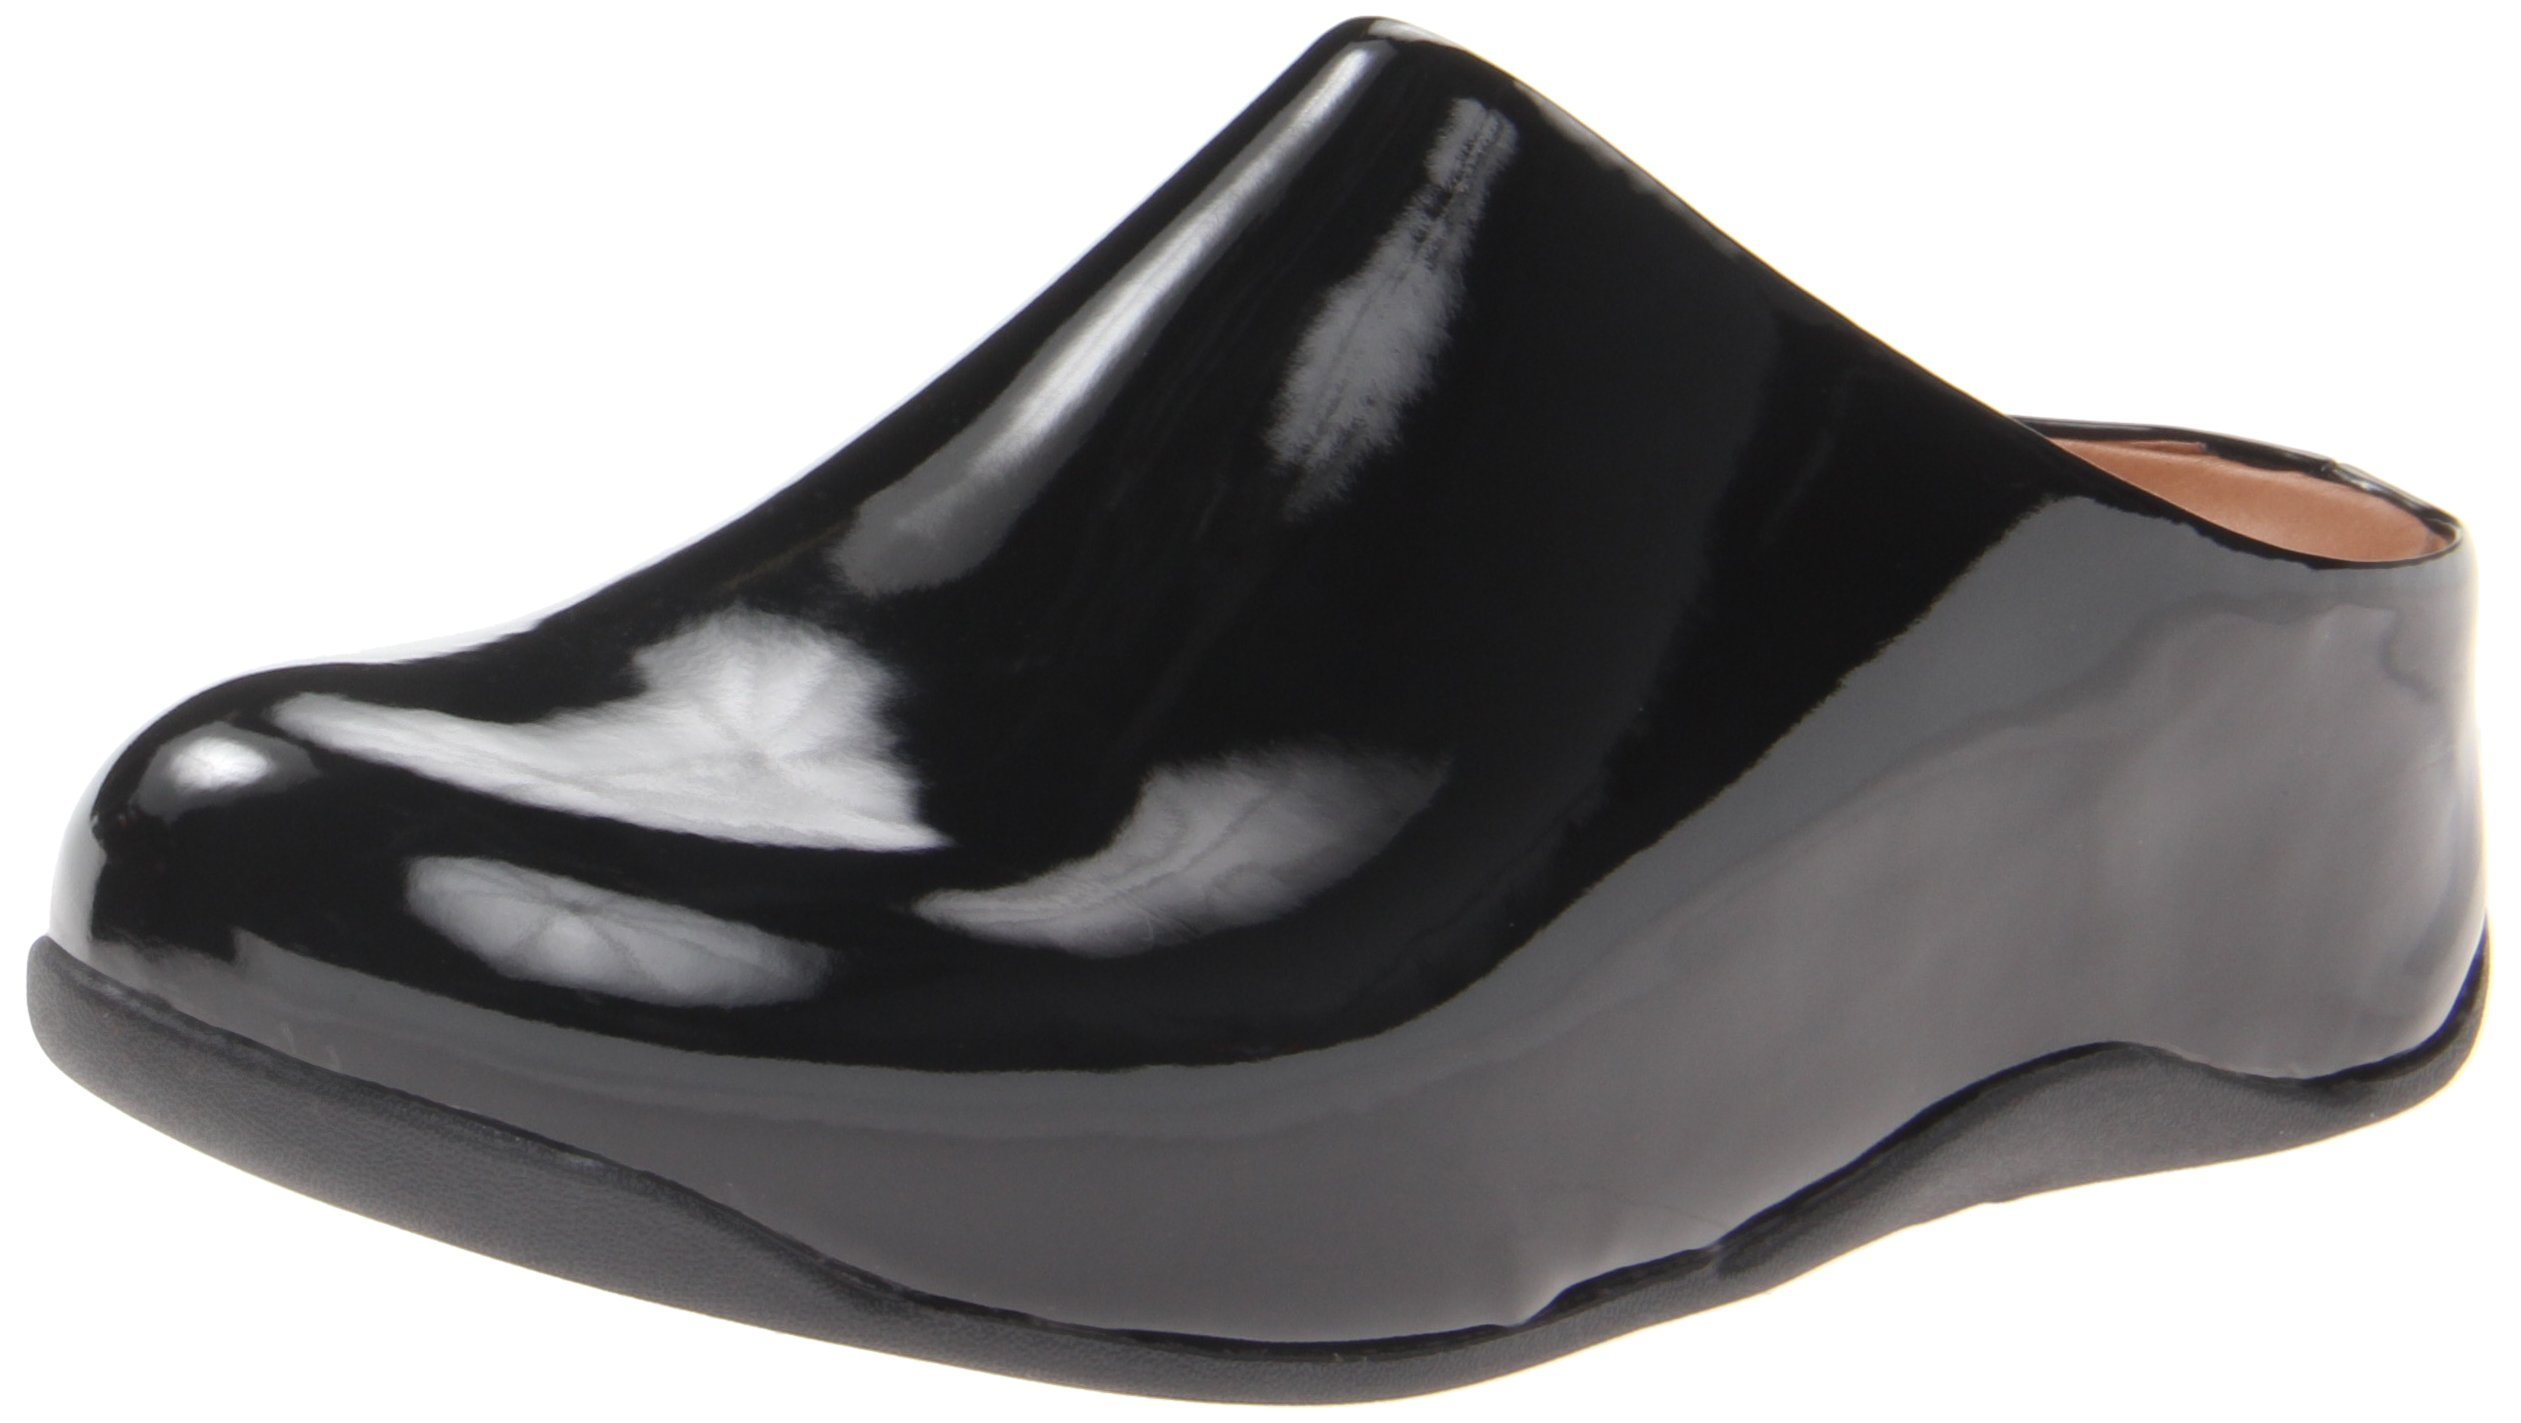 FitFlop Women's Shuv Patent Mule,Black,10 M US